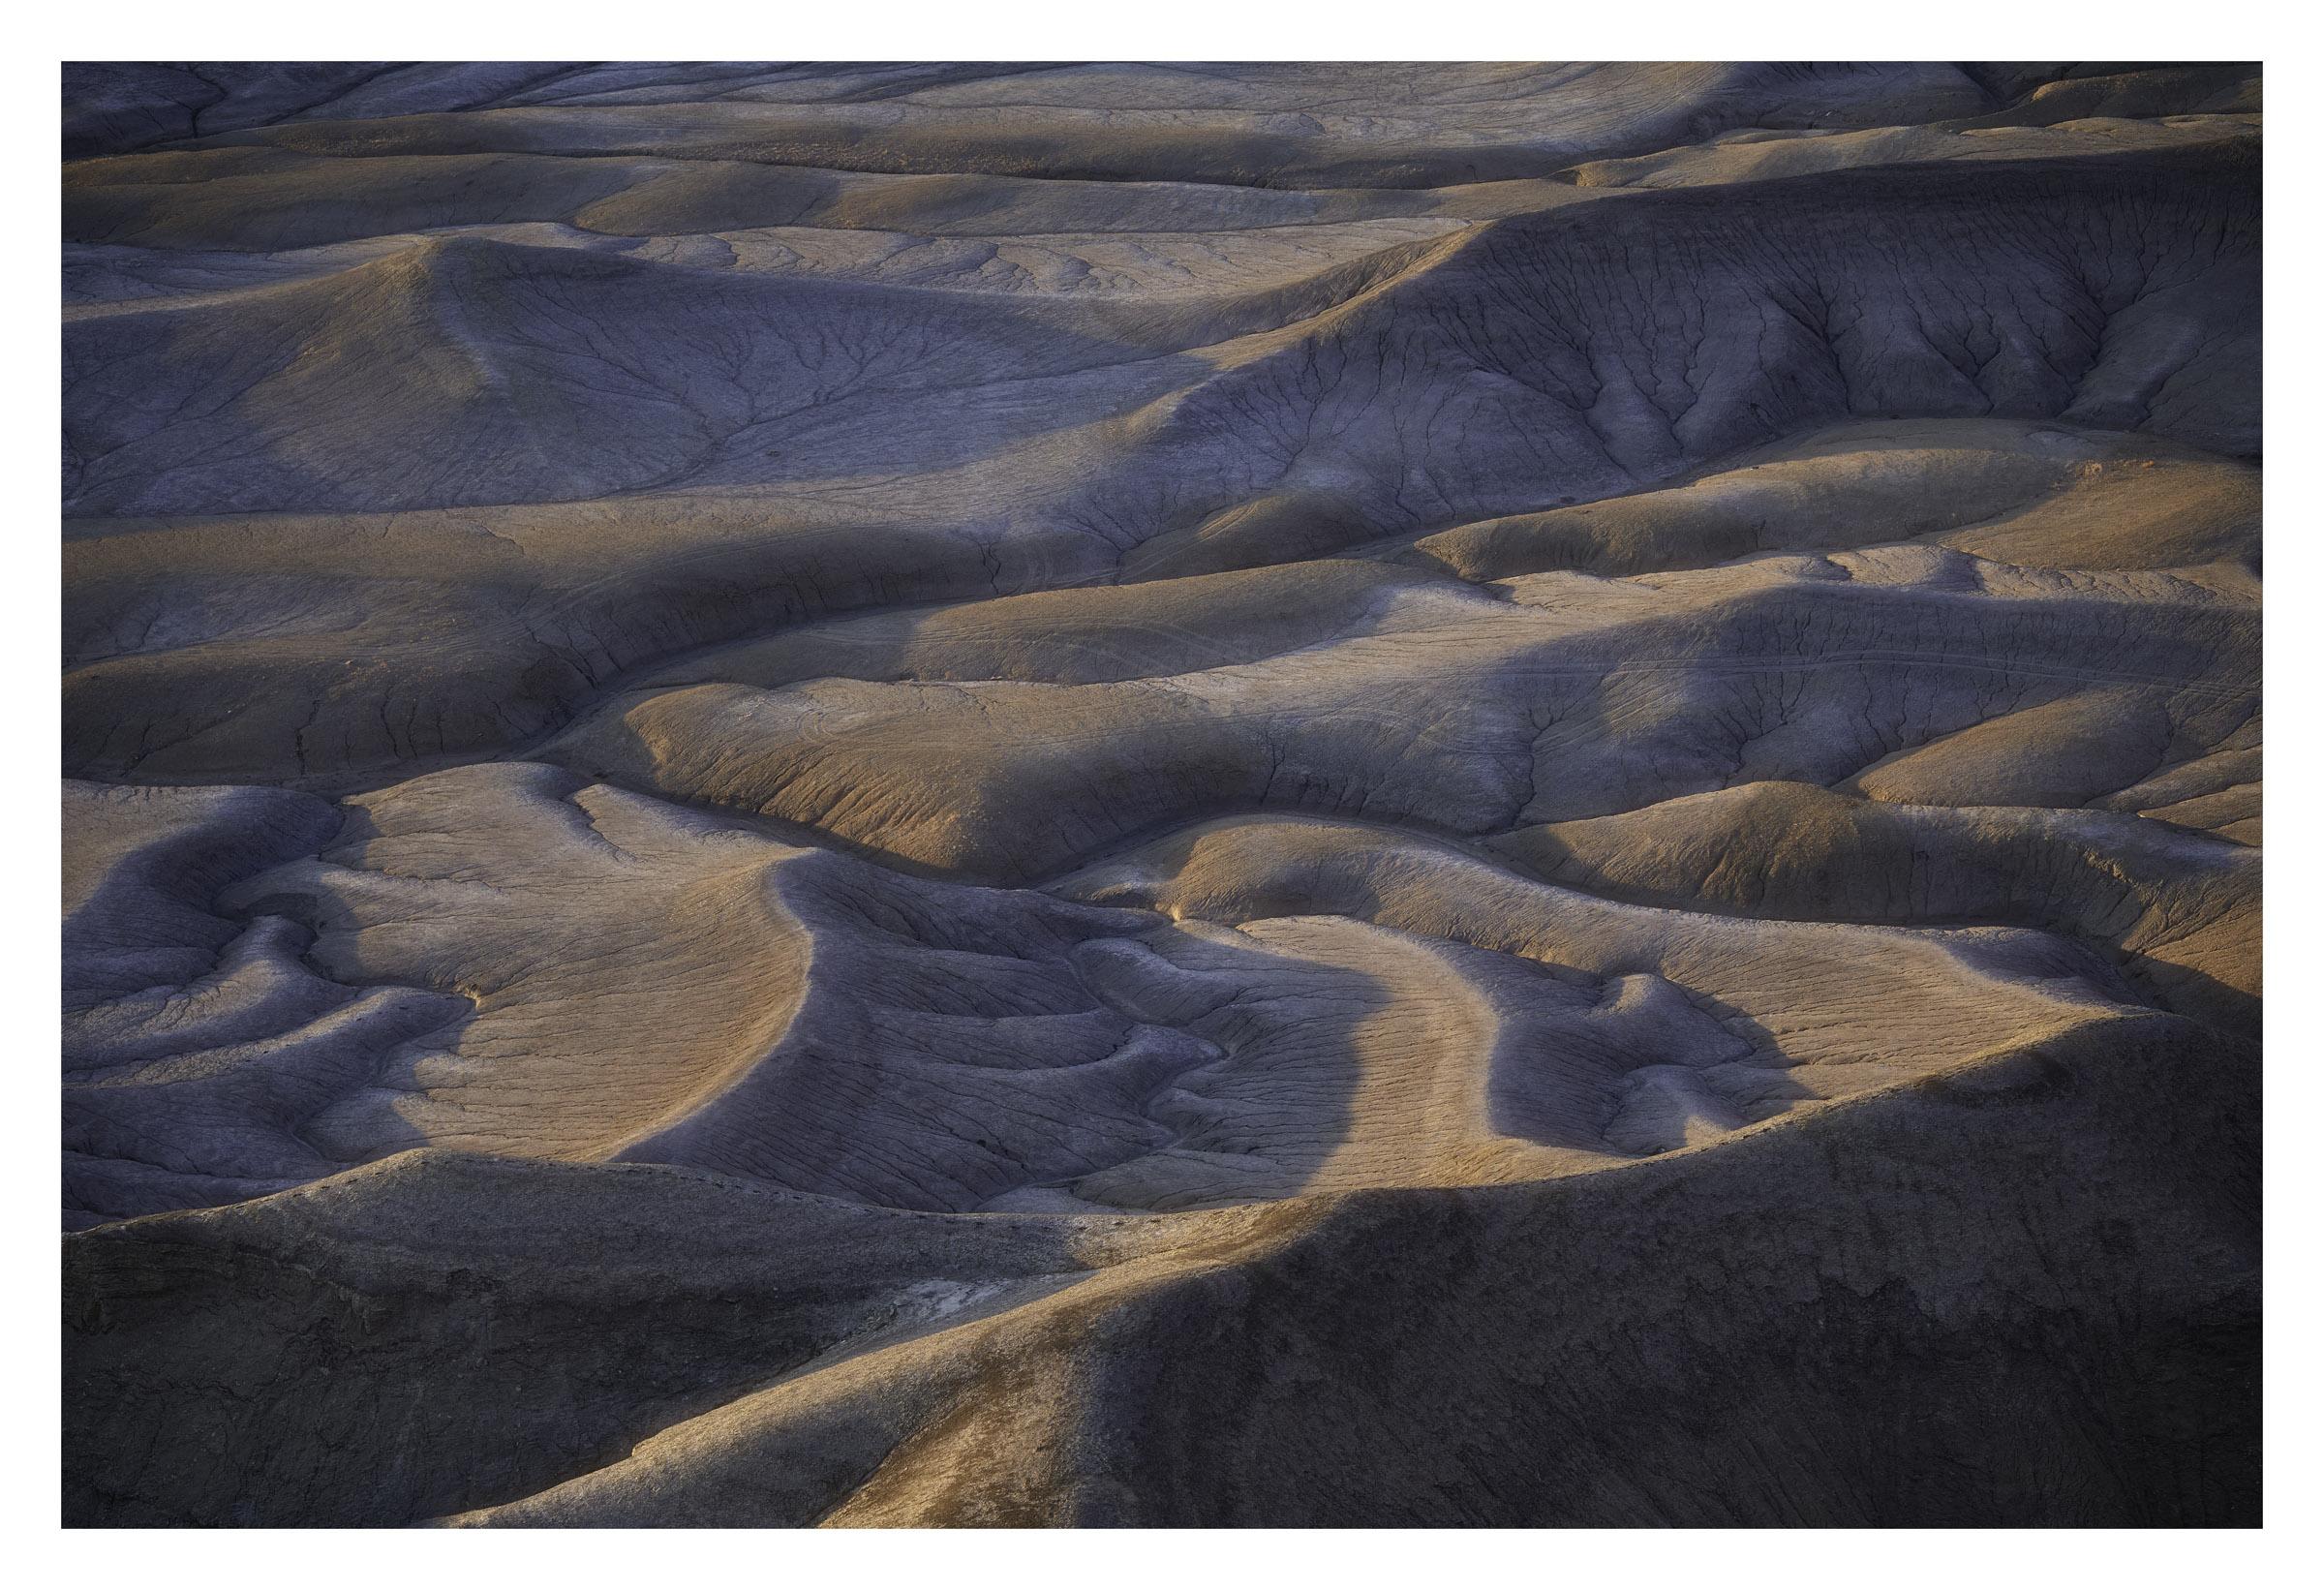 Utah landscape photography, Utah landscape photographer, landscape photographers Utah, Hanksville Utah Photography, Utah Slot Canyons, Fine Art Prints Utah Landscapes, Utah landscape prints, buy prints of Utah landscapes, Utah landscape photographers